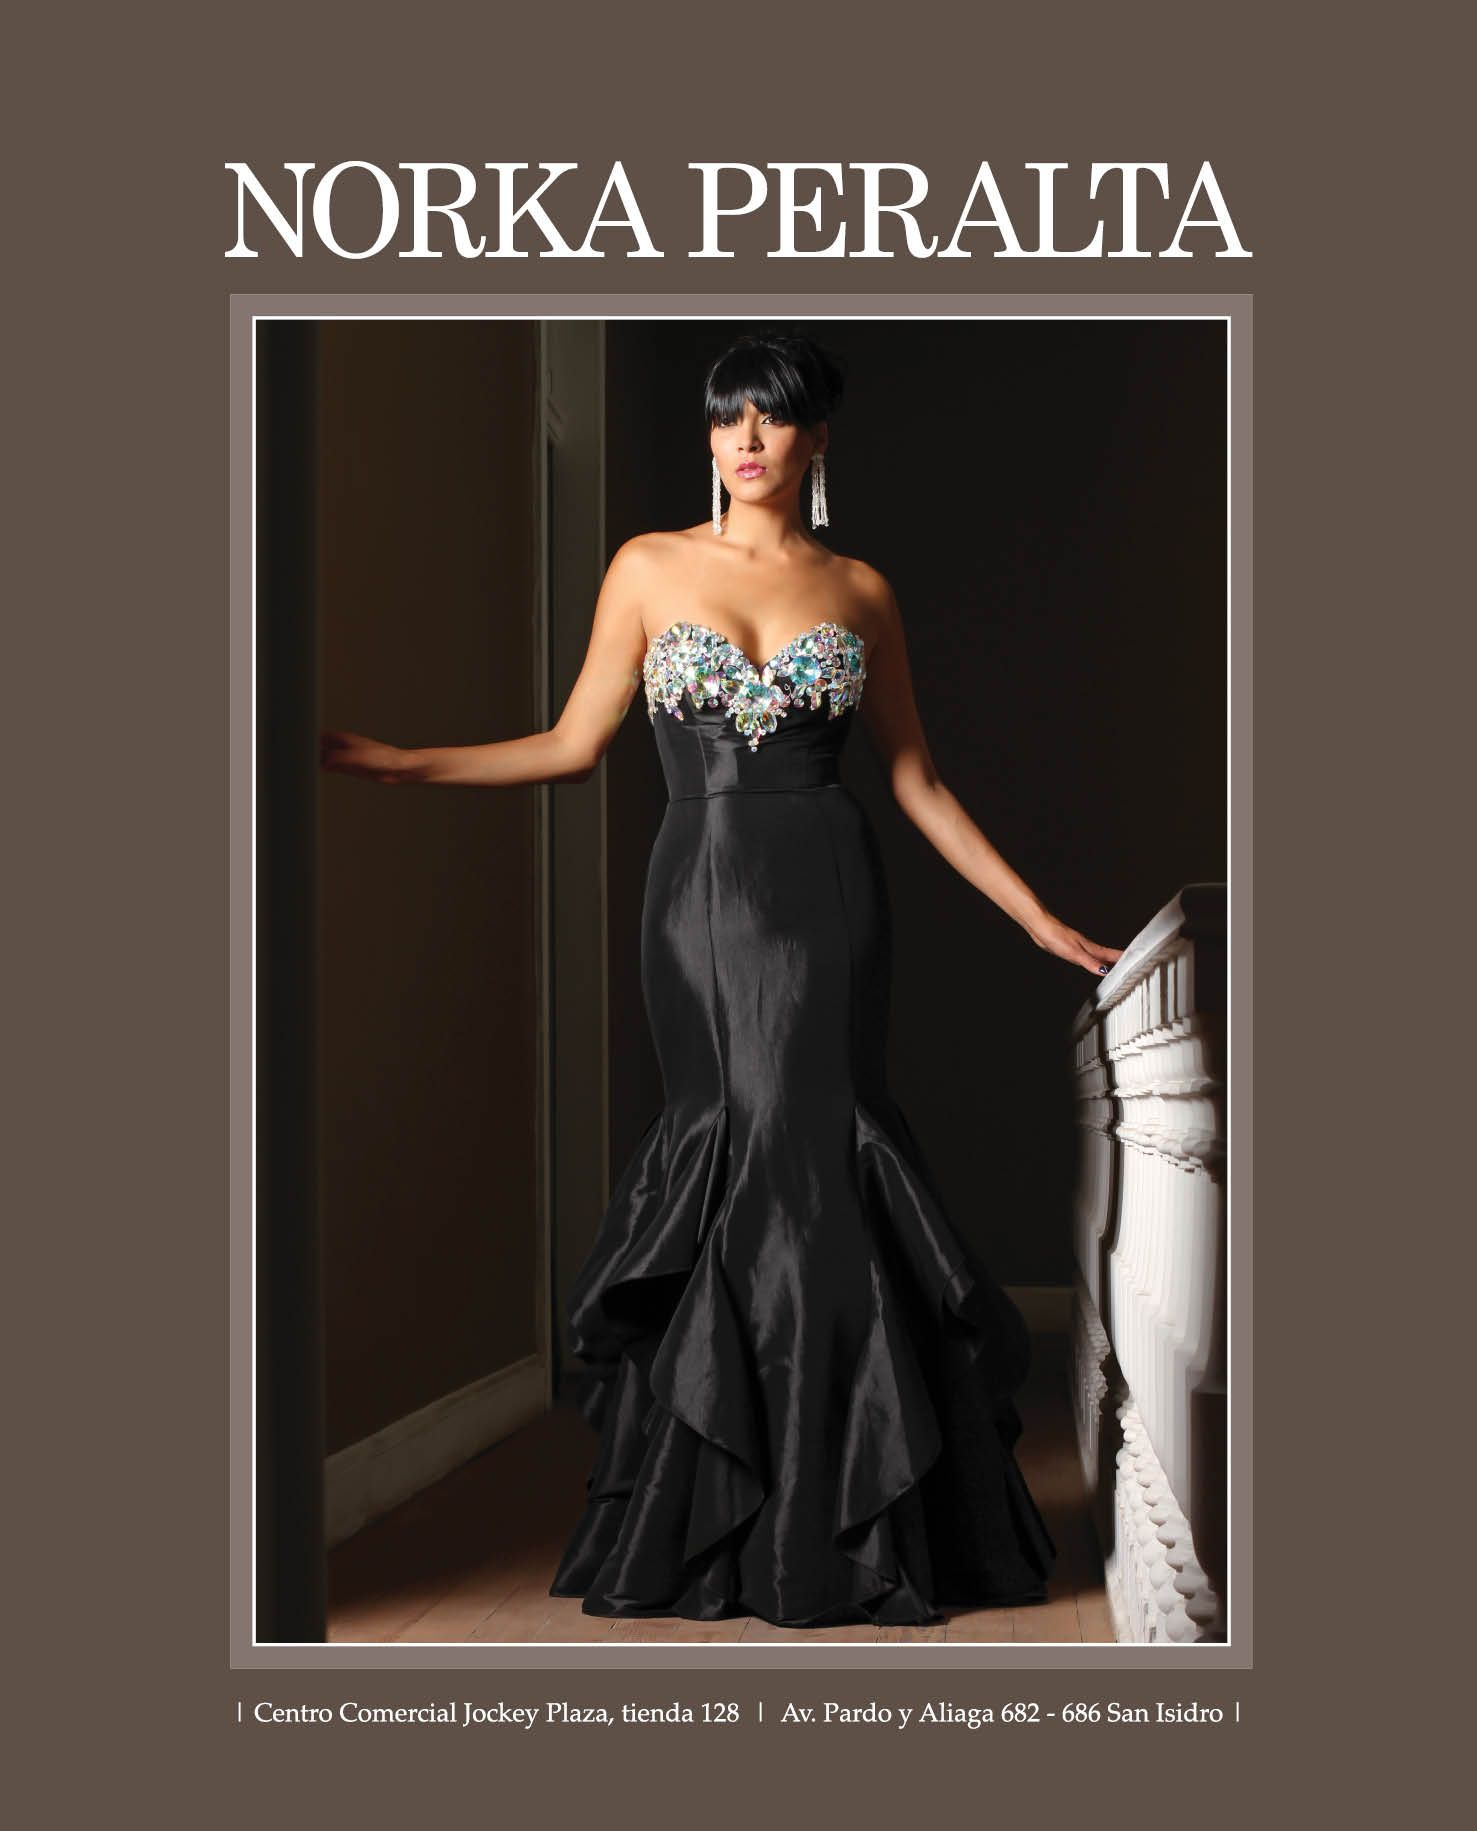 012c0f83e Norka Peralta  JockeyPlaza  Dresses  Fashion  Shopping Disenos De Unas